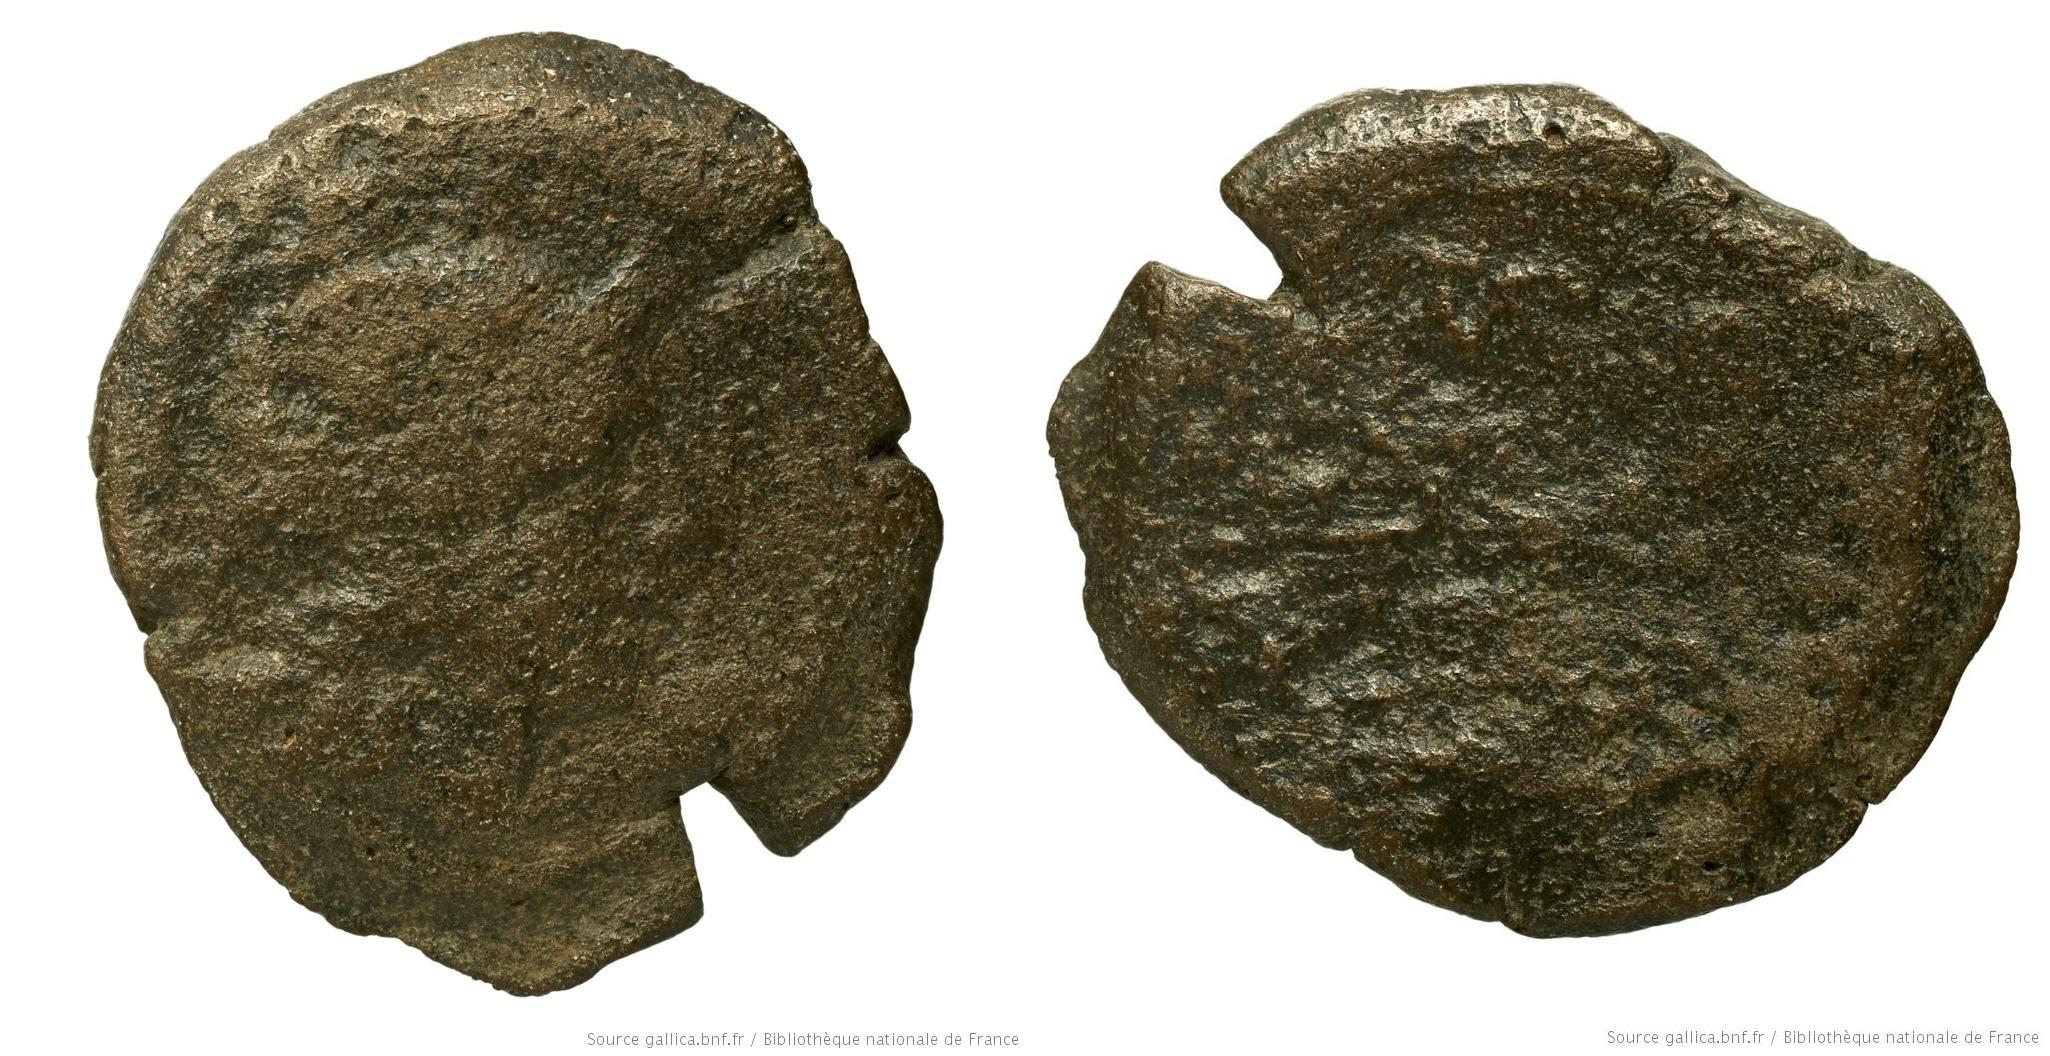 545BA – Once Baebia – Cnaeus Baebius Tampilus